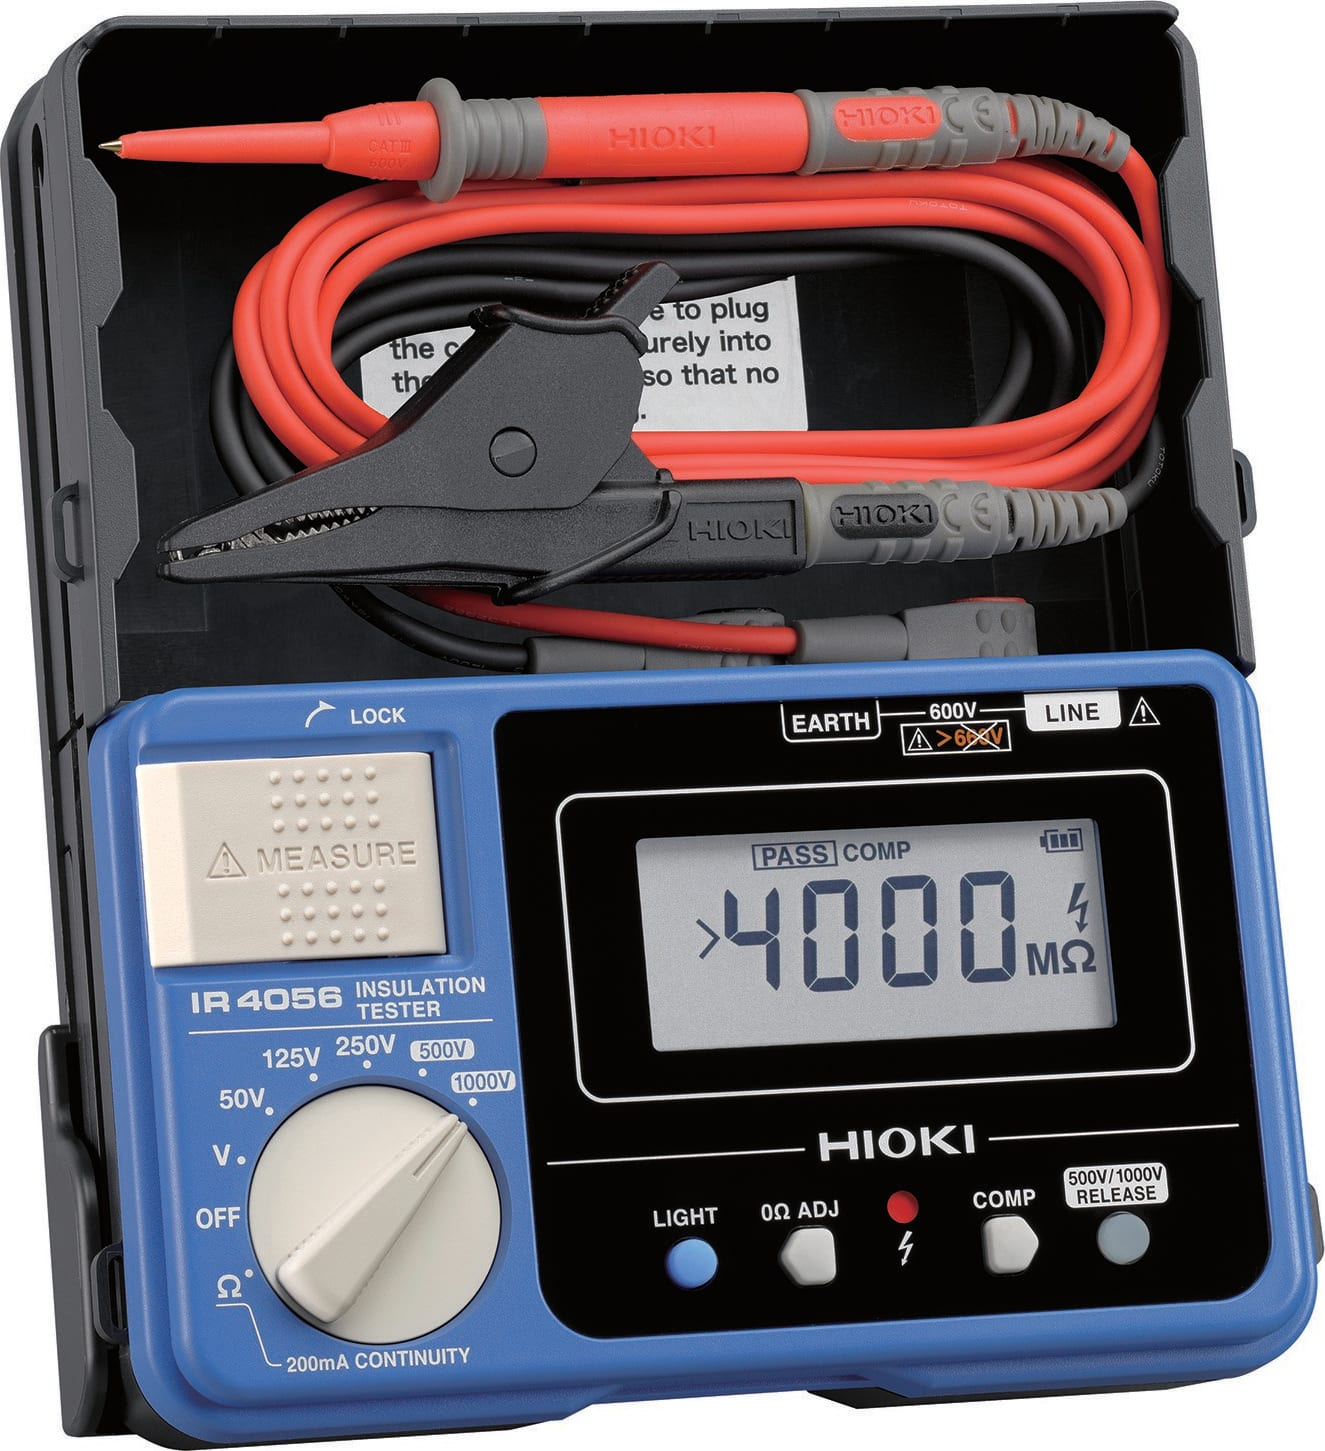 250V to 5000V Hioki IR3455-01 5-Range High Voltage Insulation Tester